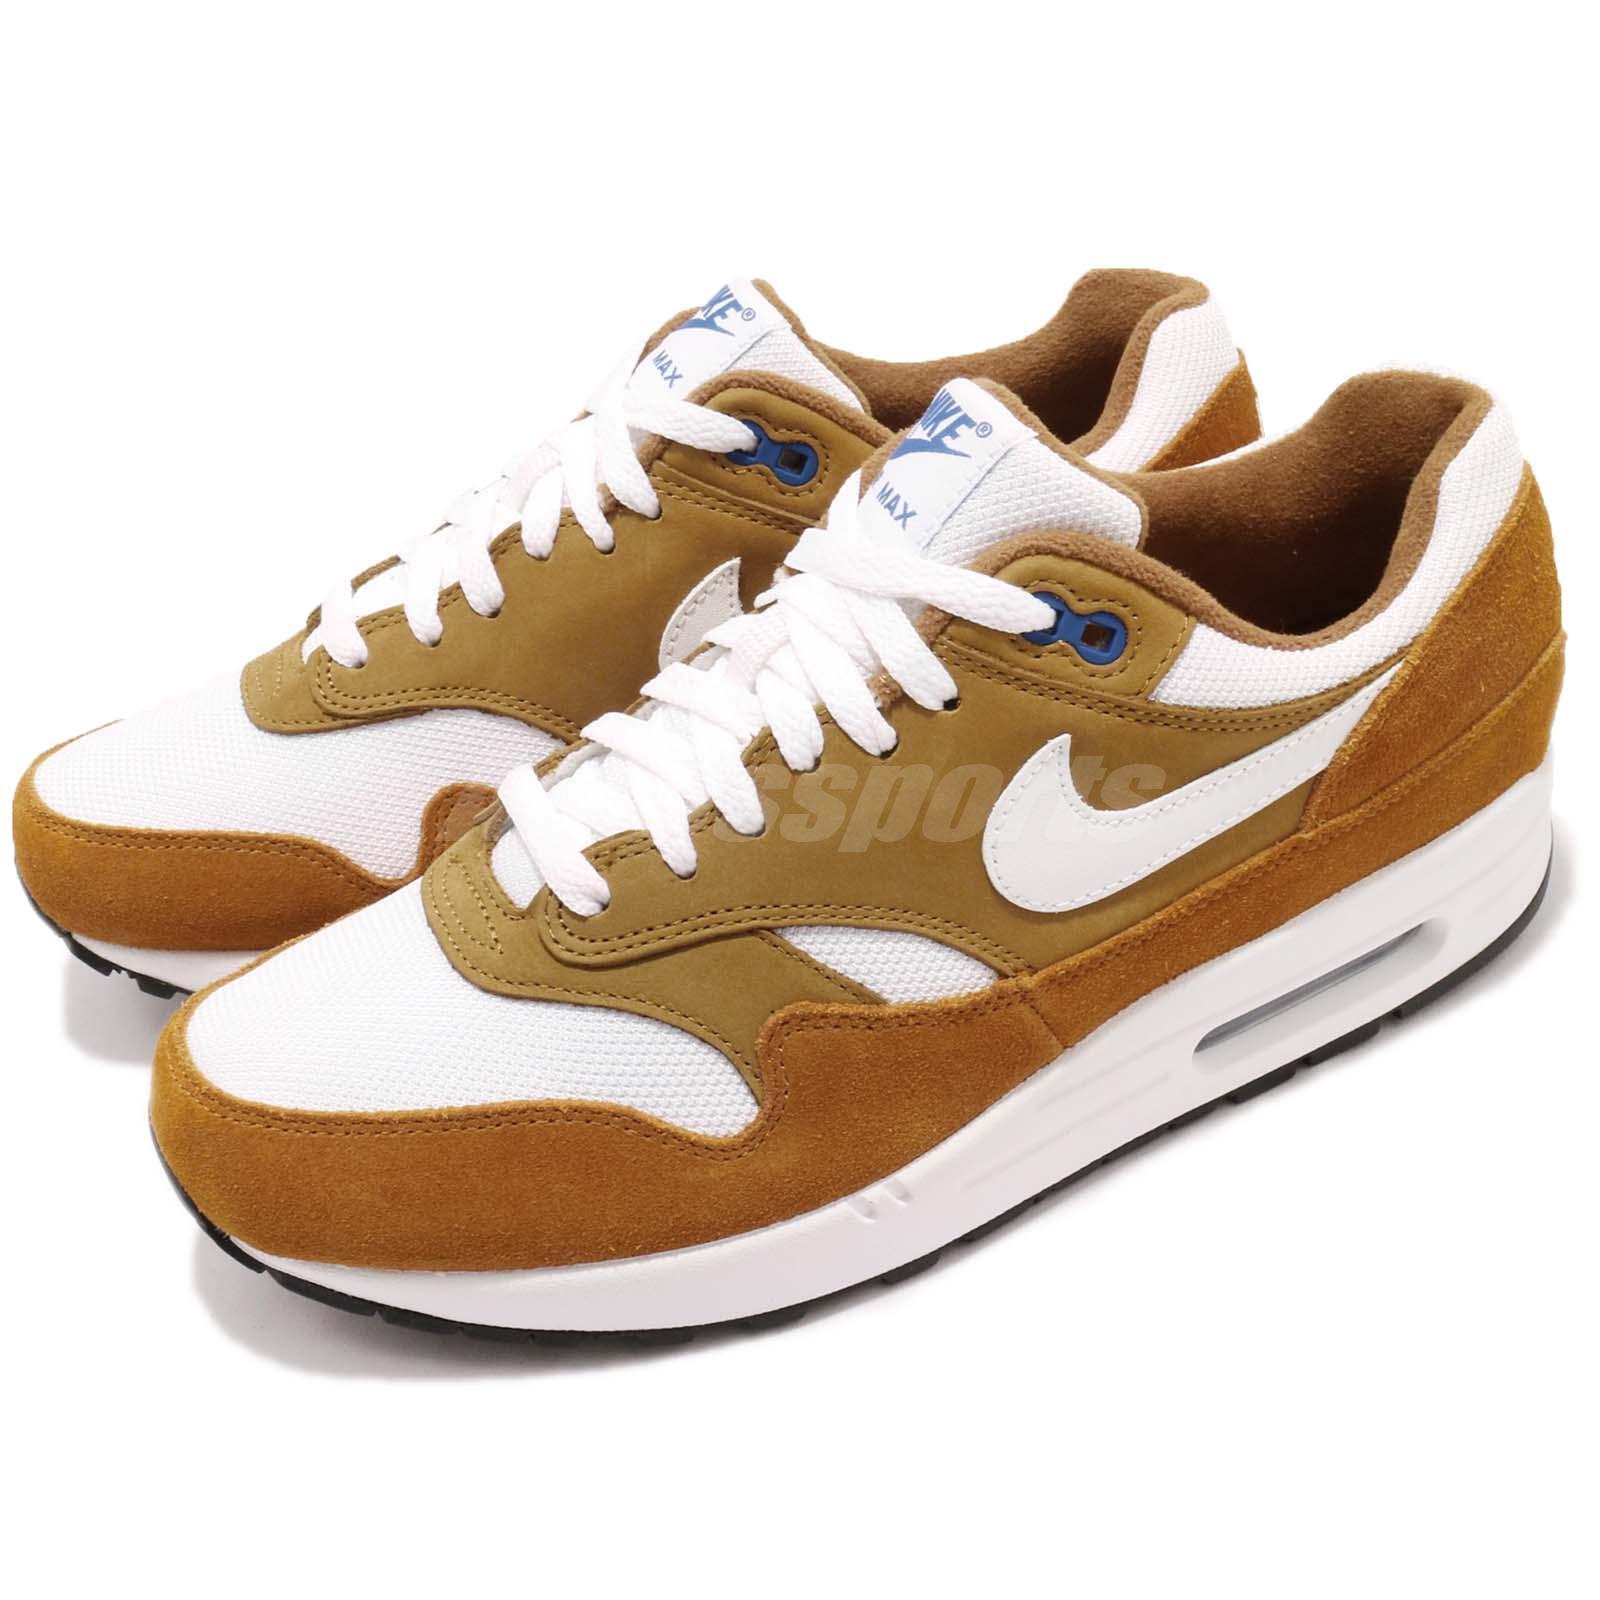 Nike Air Max 1 Premium Retro I Atmos Dark Dark Dark Curry Hommes  Running Shoes 908366-700 1b1918